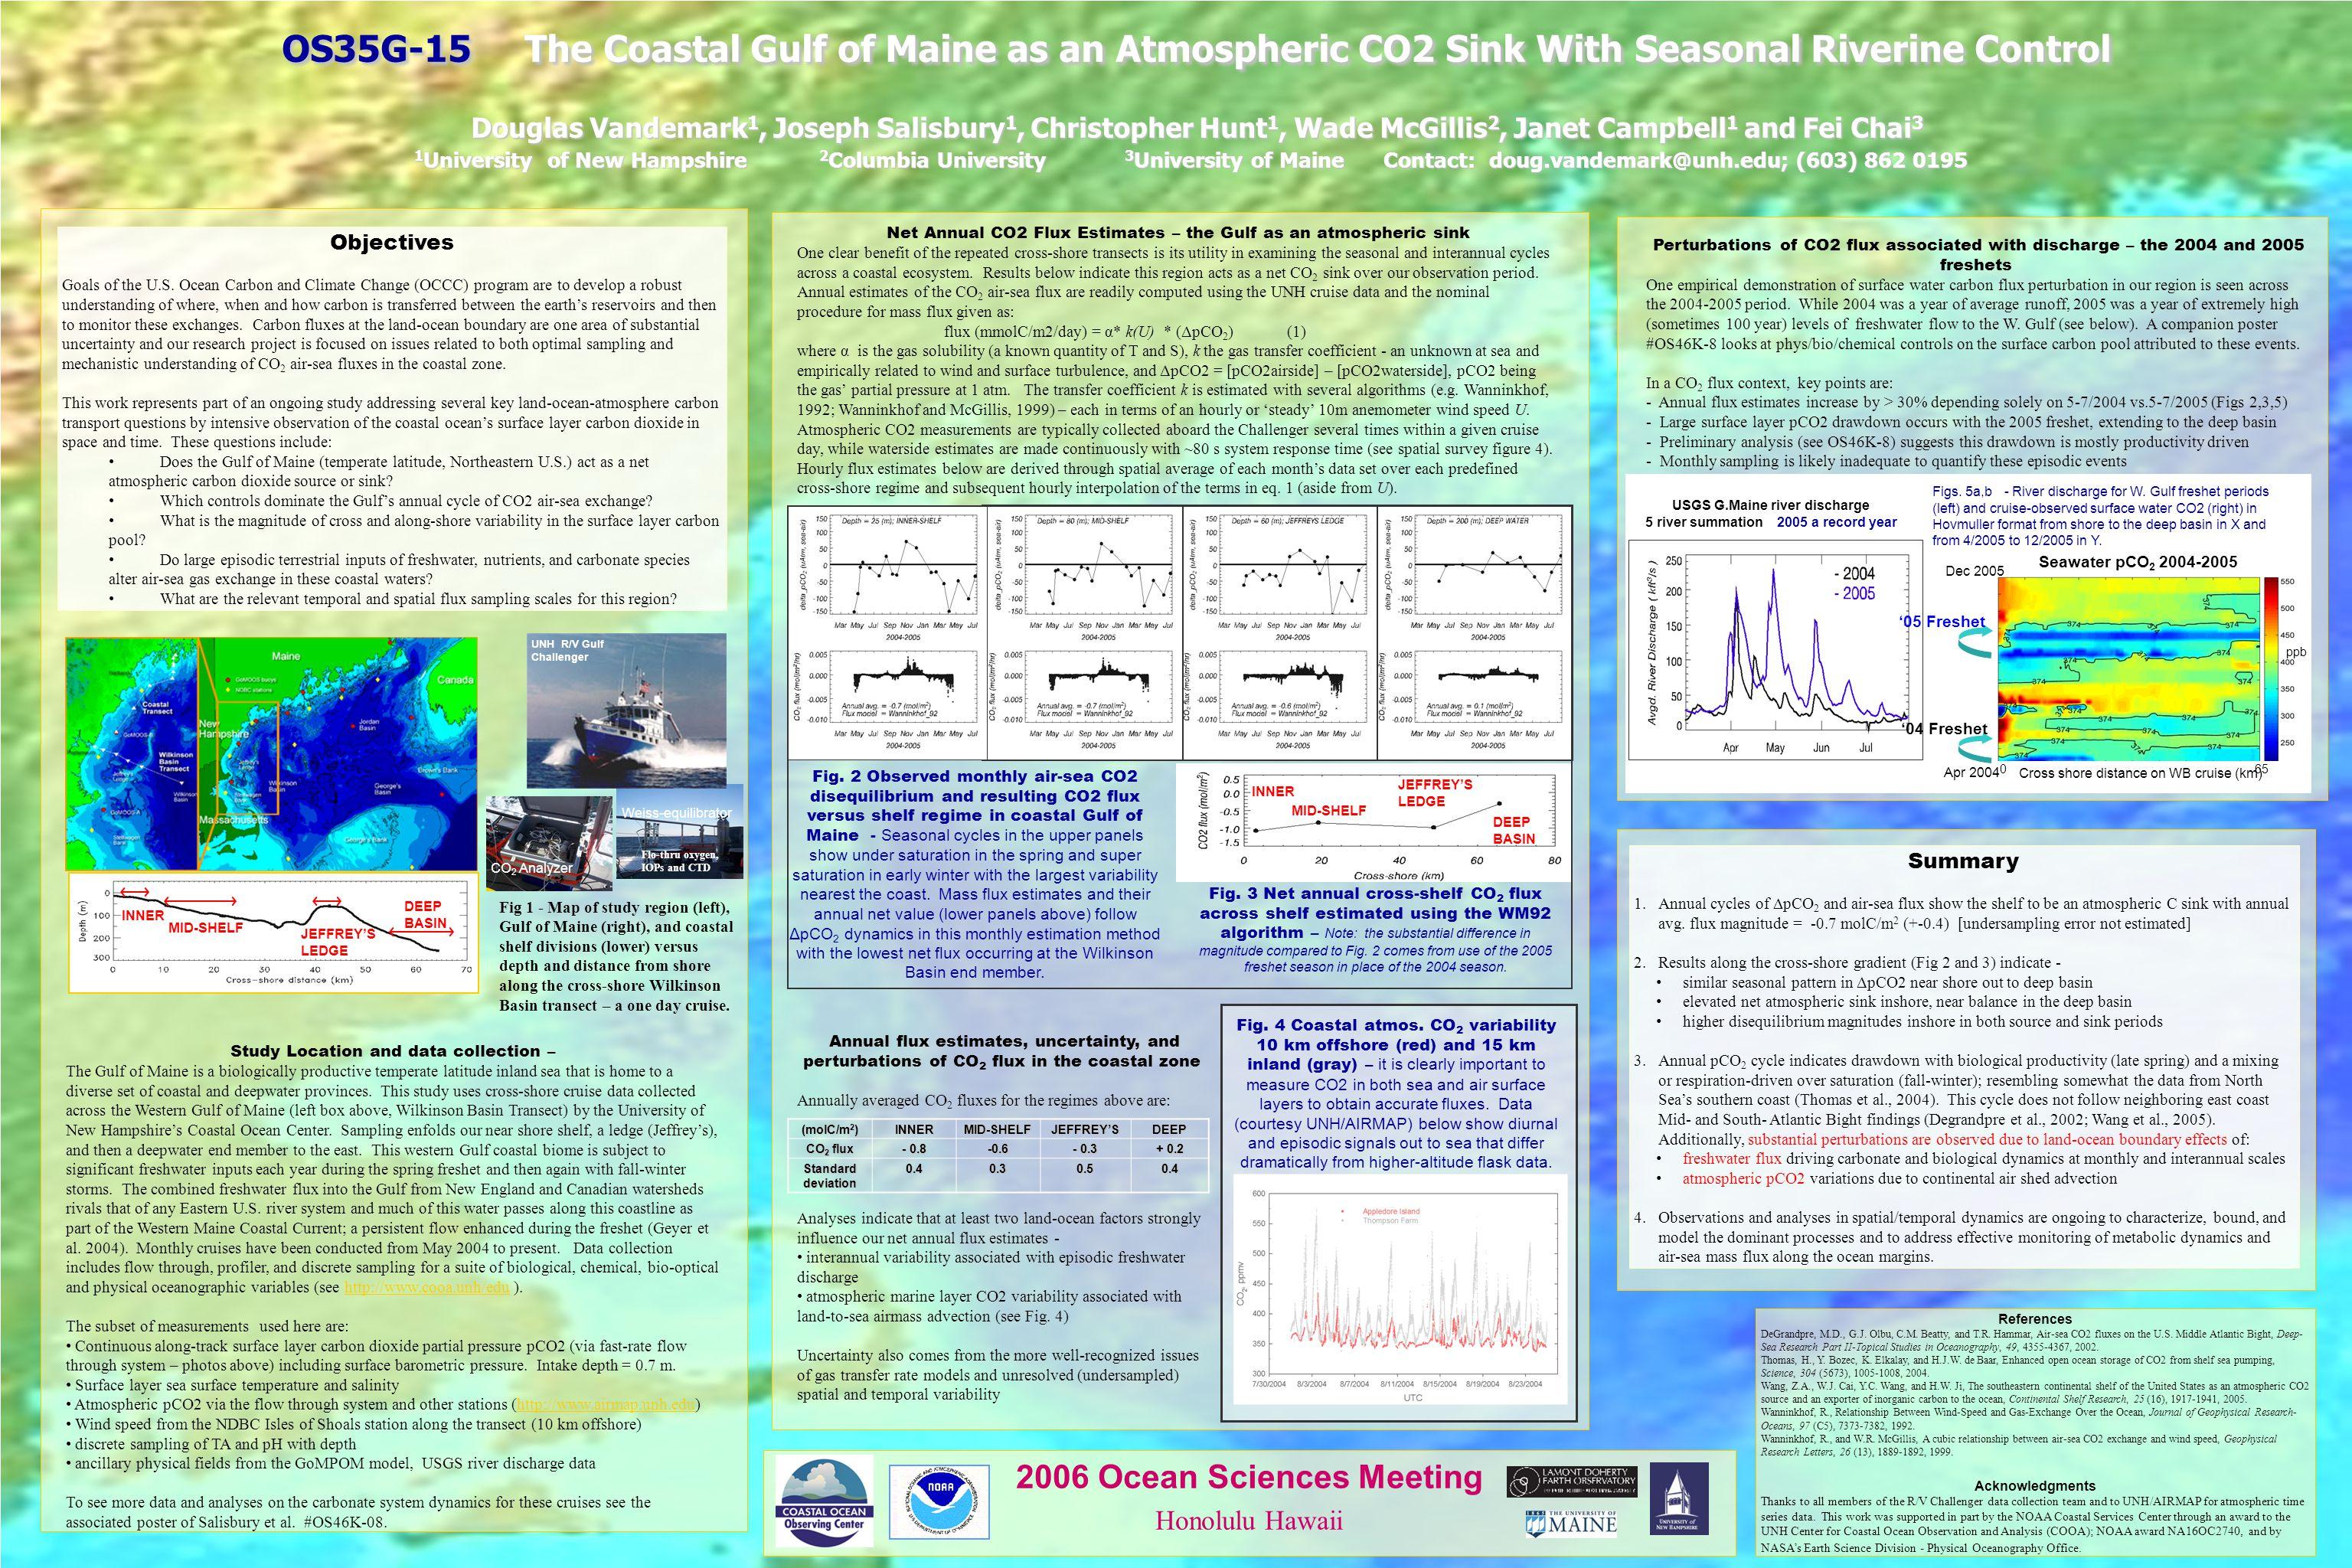 OS35G-15 The Coastal Gulf of Maine as an Atmospheric CO2 Sink With Seasonal Riverine Control Douglas Vandemark 1, Joseph Salisbury 1, Christopher Hunt